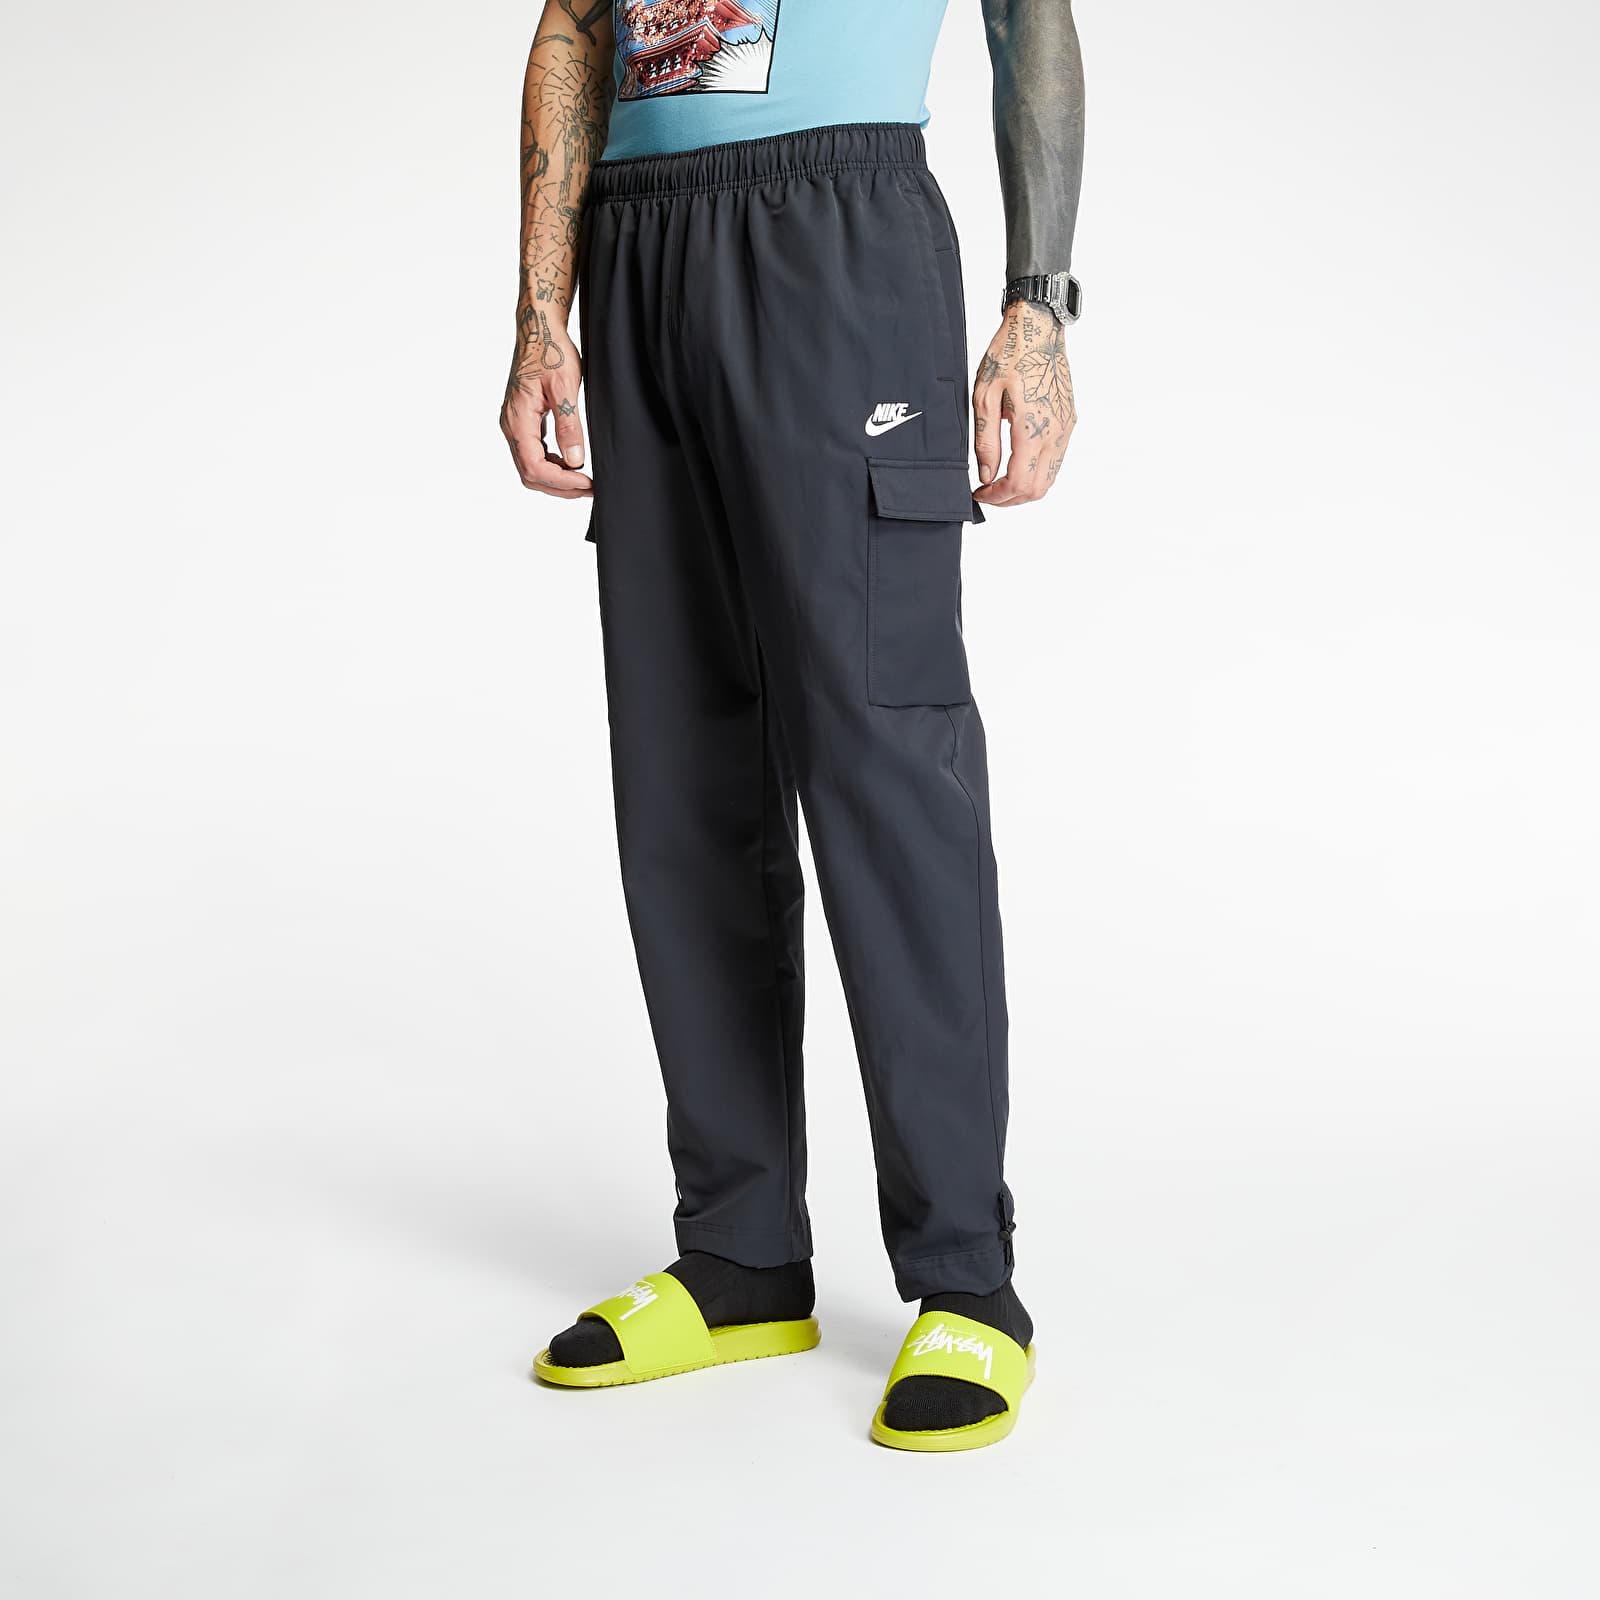 Pants and jeans Nike Sportswear Woven Pants Black/ White